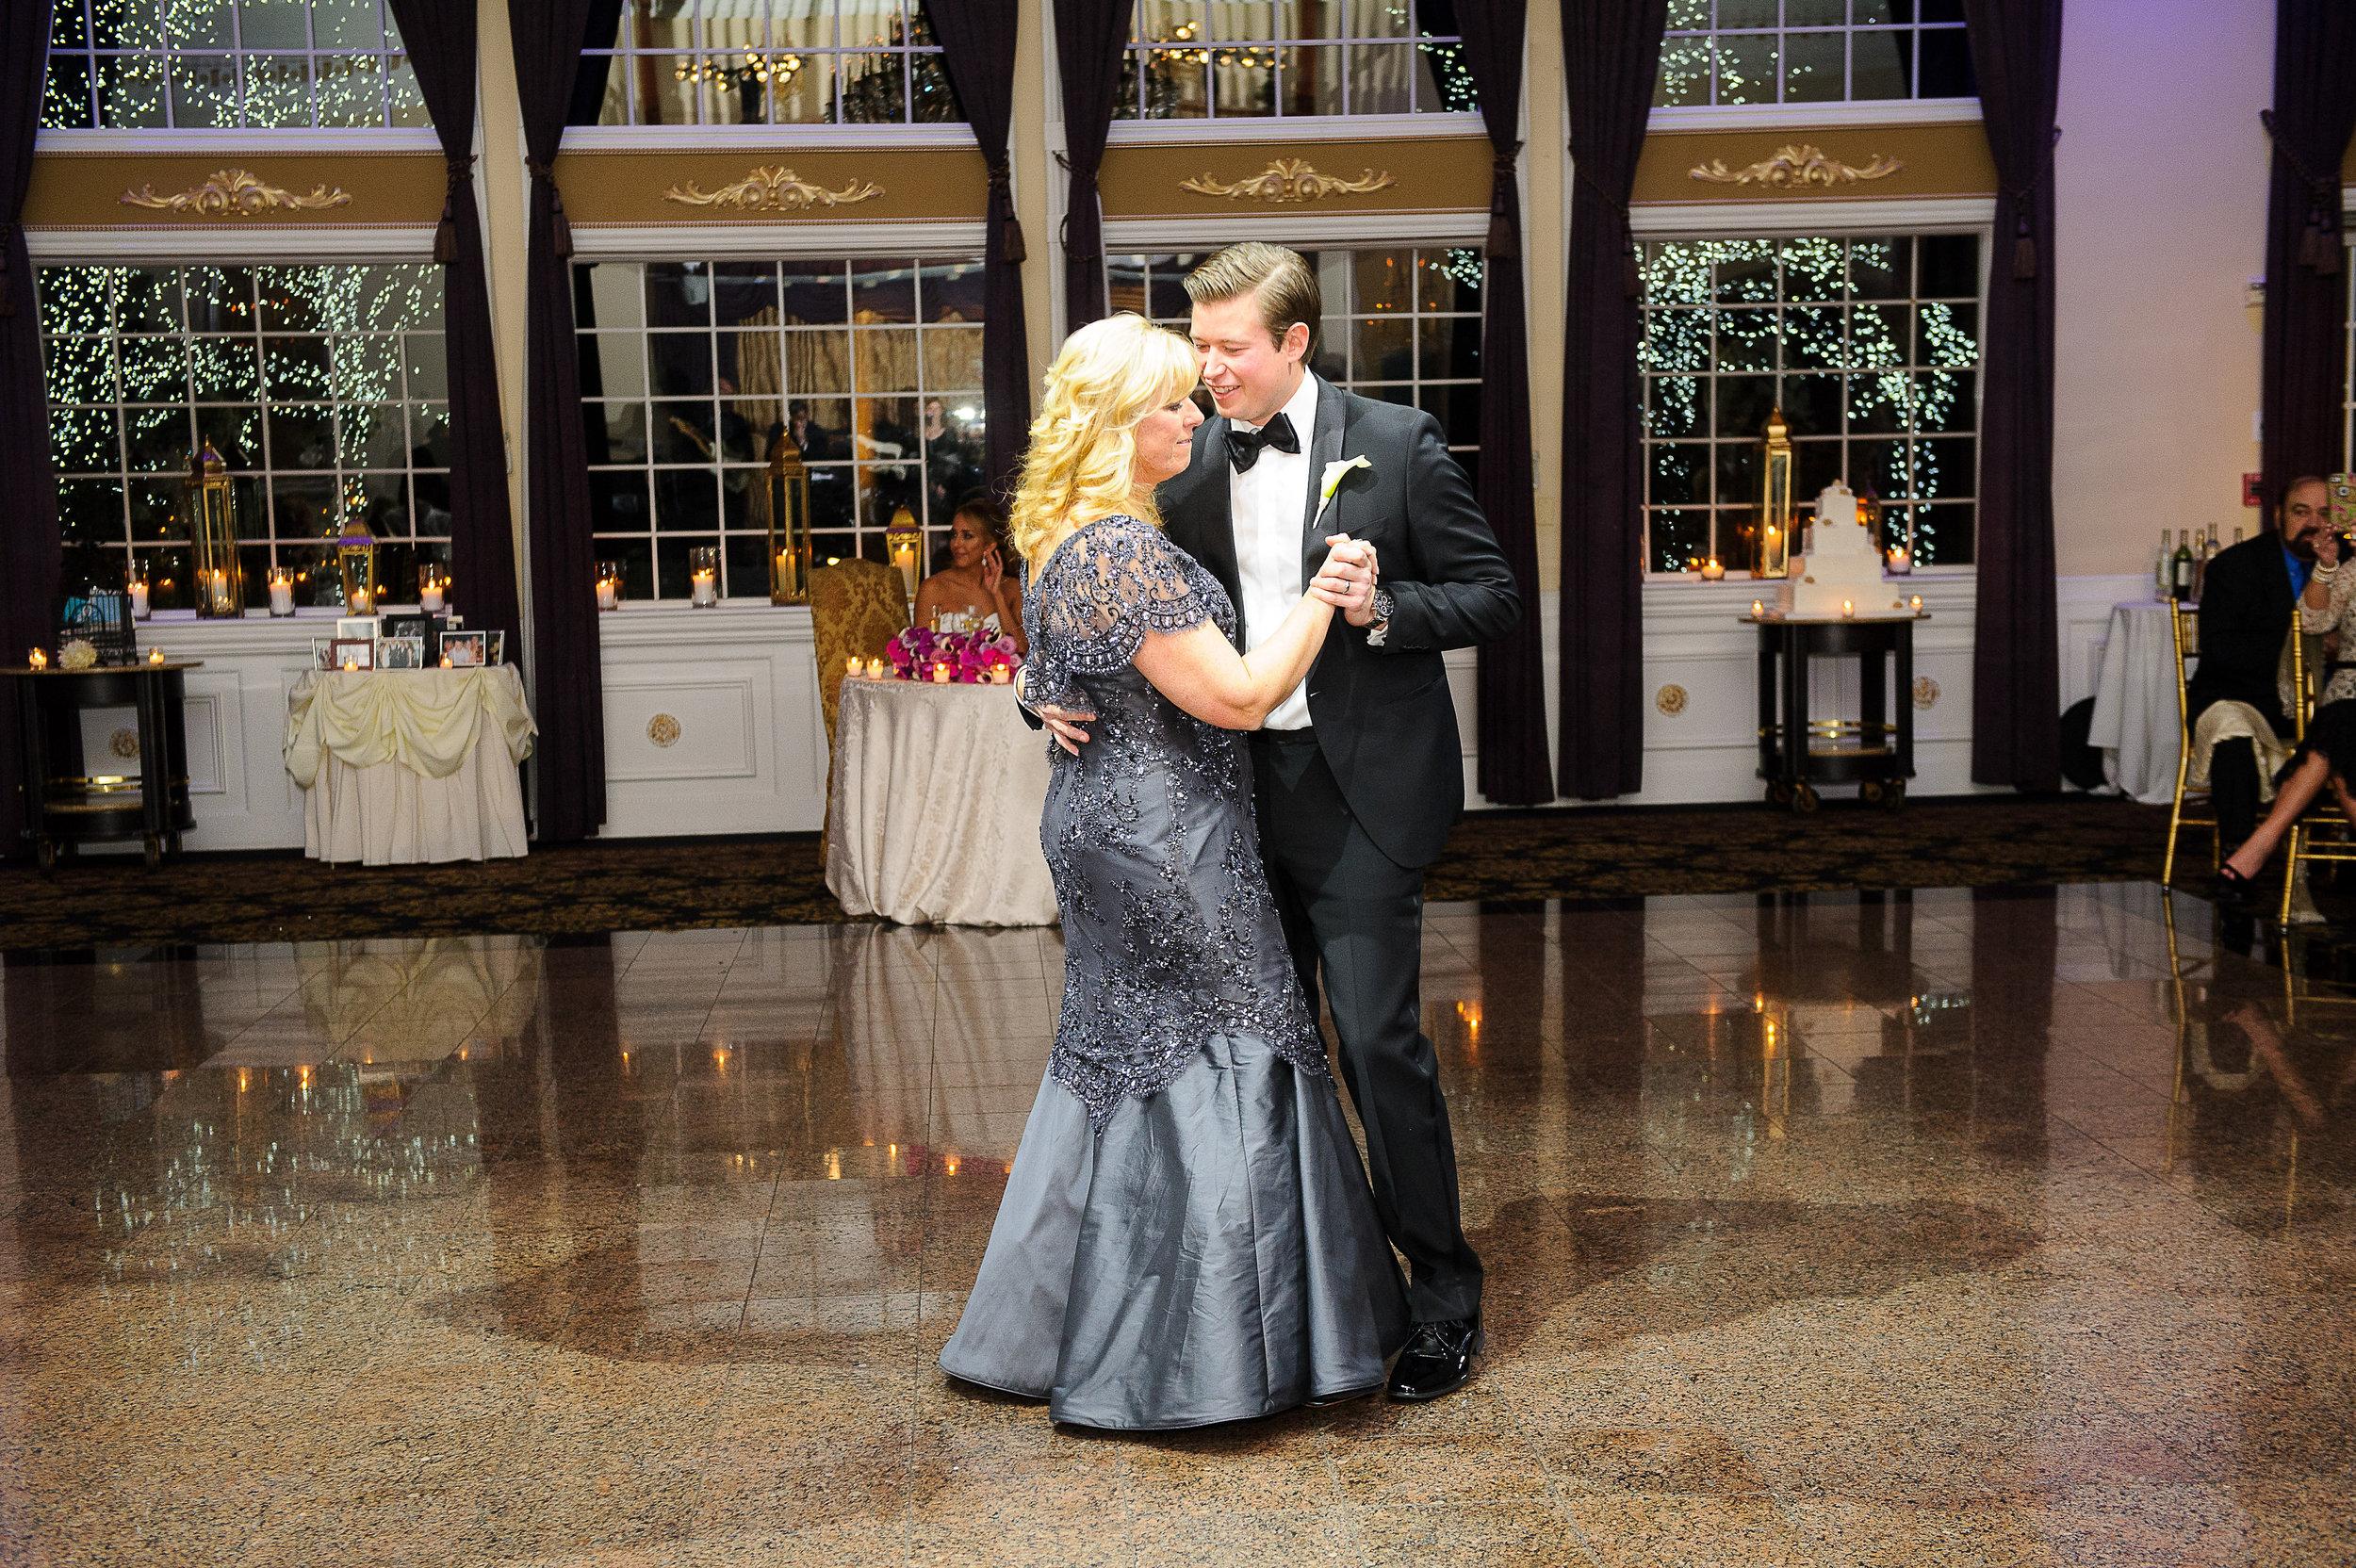 Ceci_New_York_Custom_Invitation_ New_Jersey_Wedding_Luxury_Personalized_Ceci_Style_Bride_Foil_Stamping119.JPG